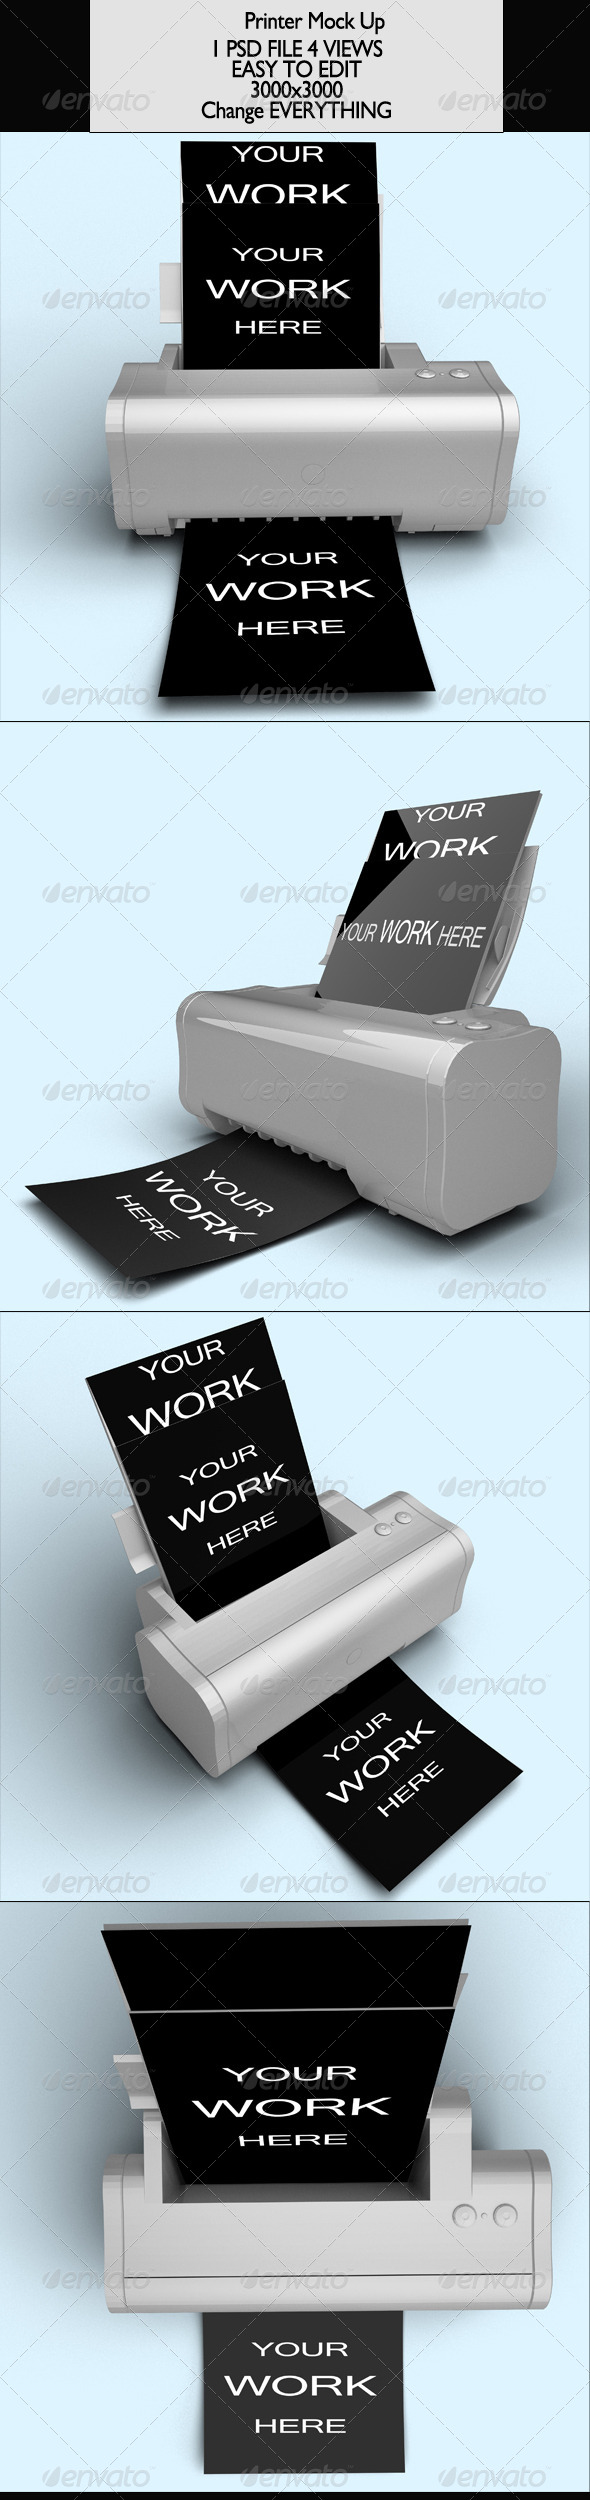 Printer Vol 1 Mock-Up - Product Mock-Ups Graphics